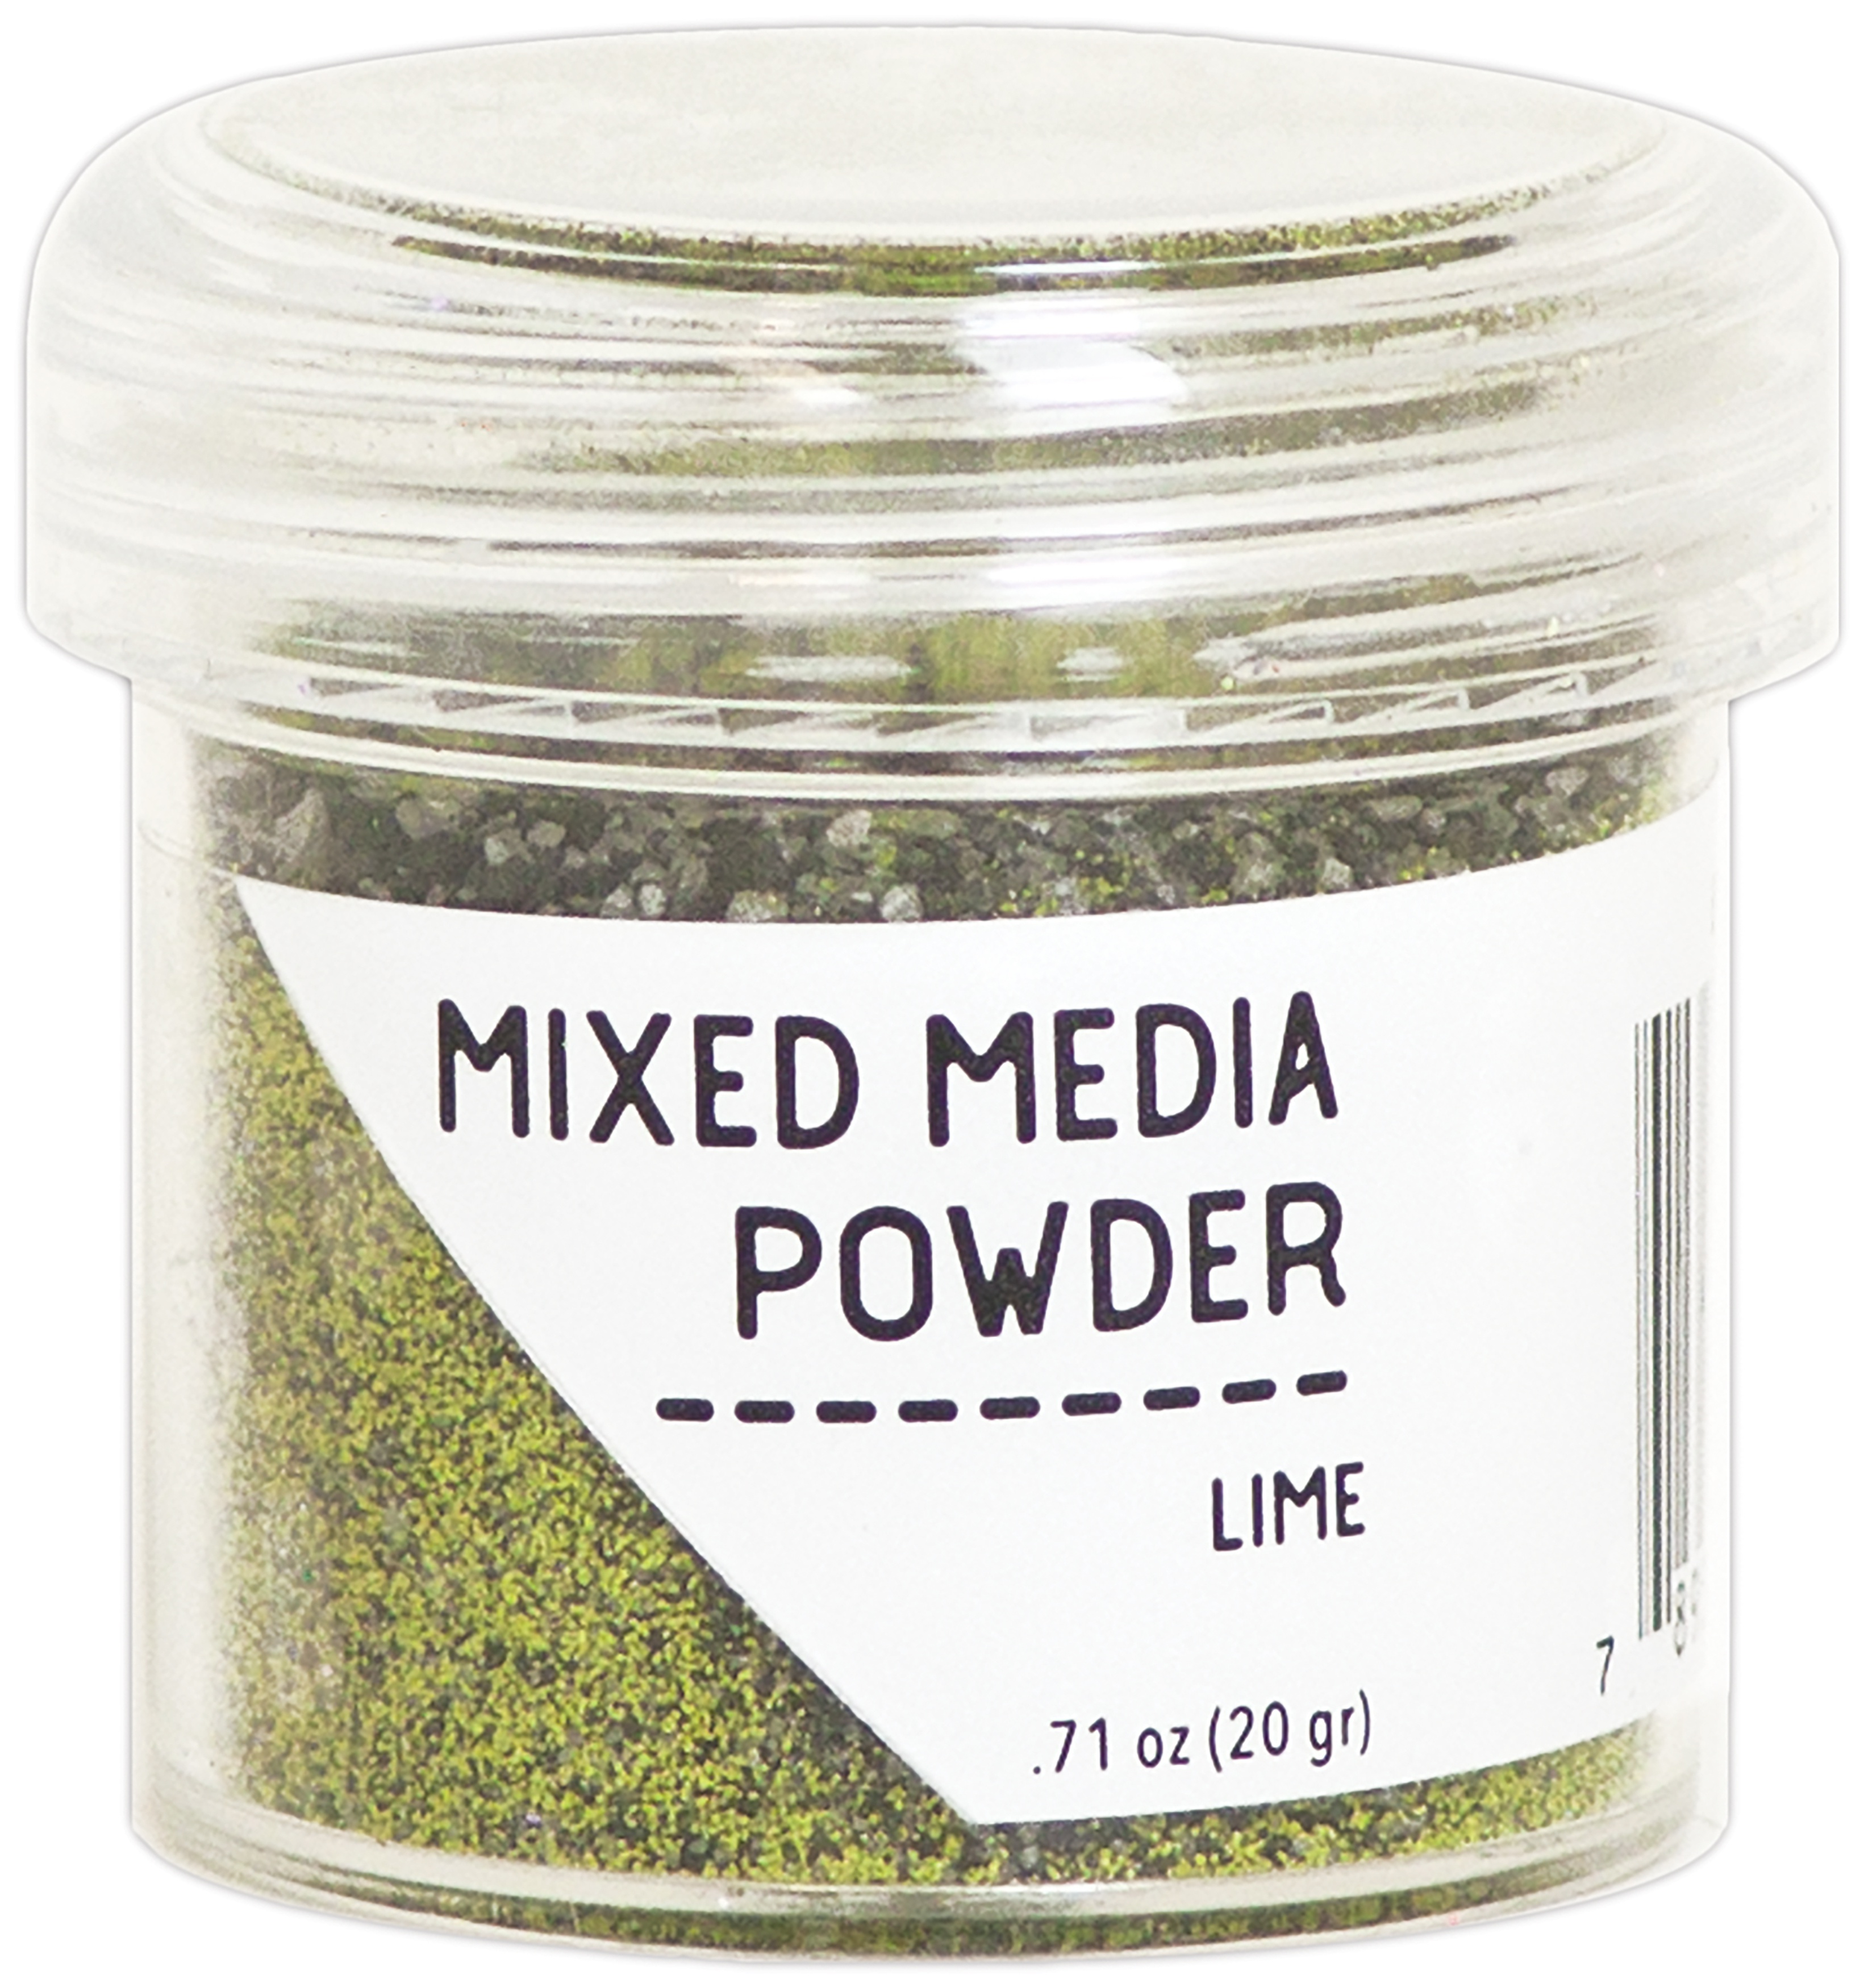 MIXED MEDIA POWDER - LIME